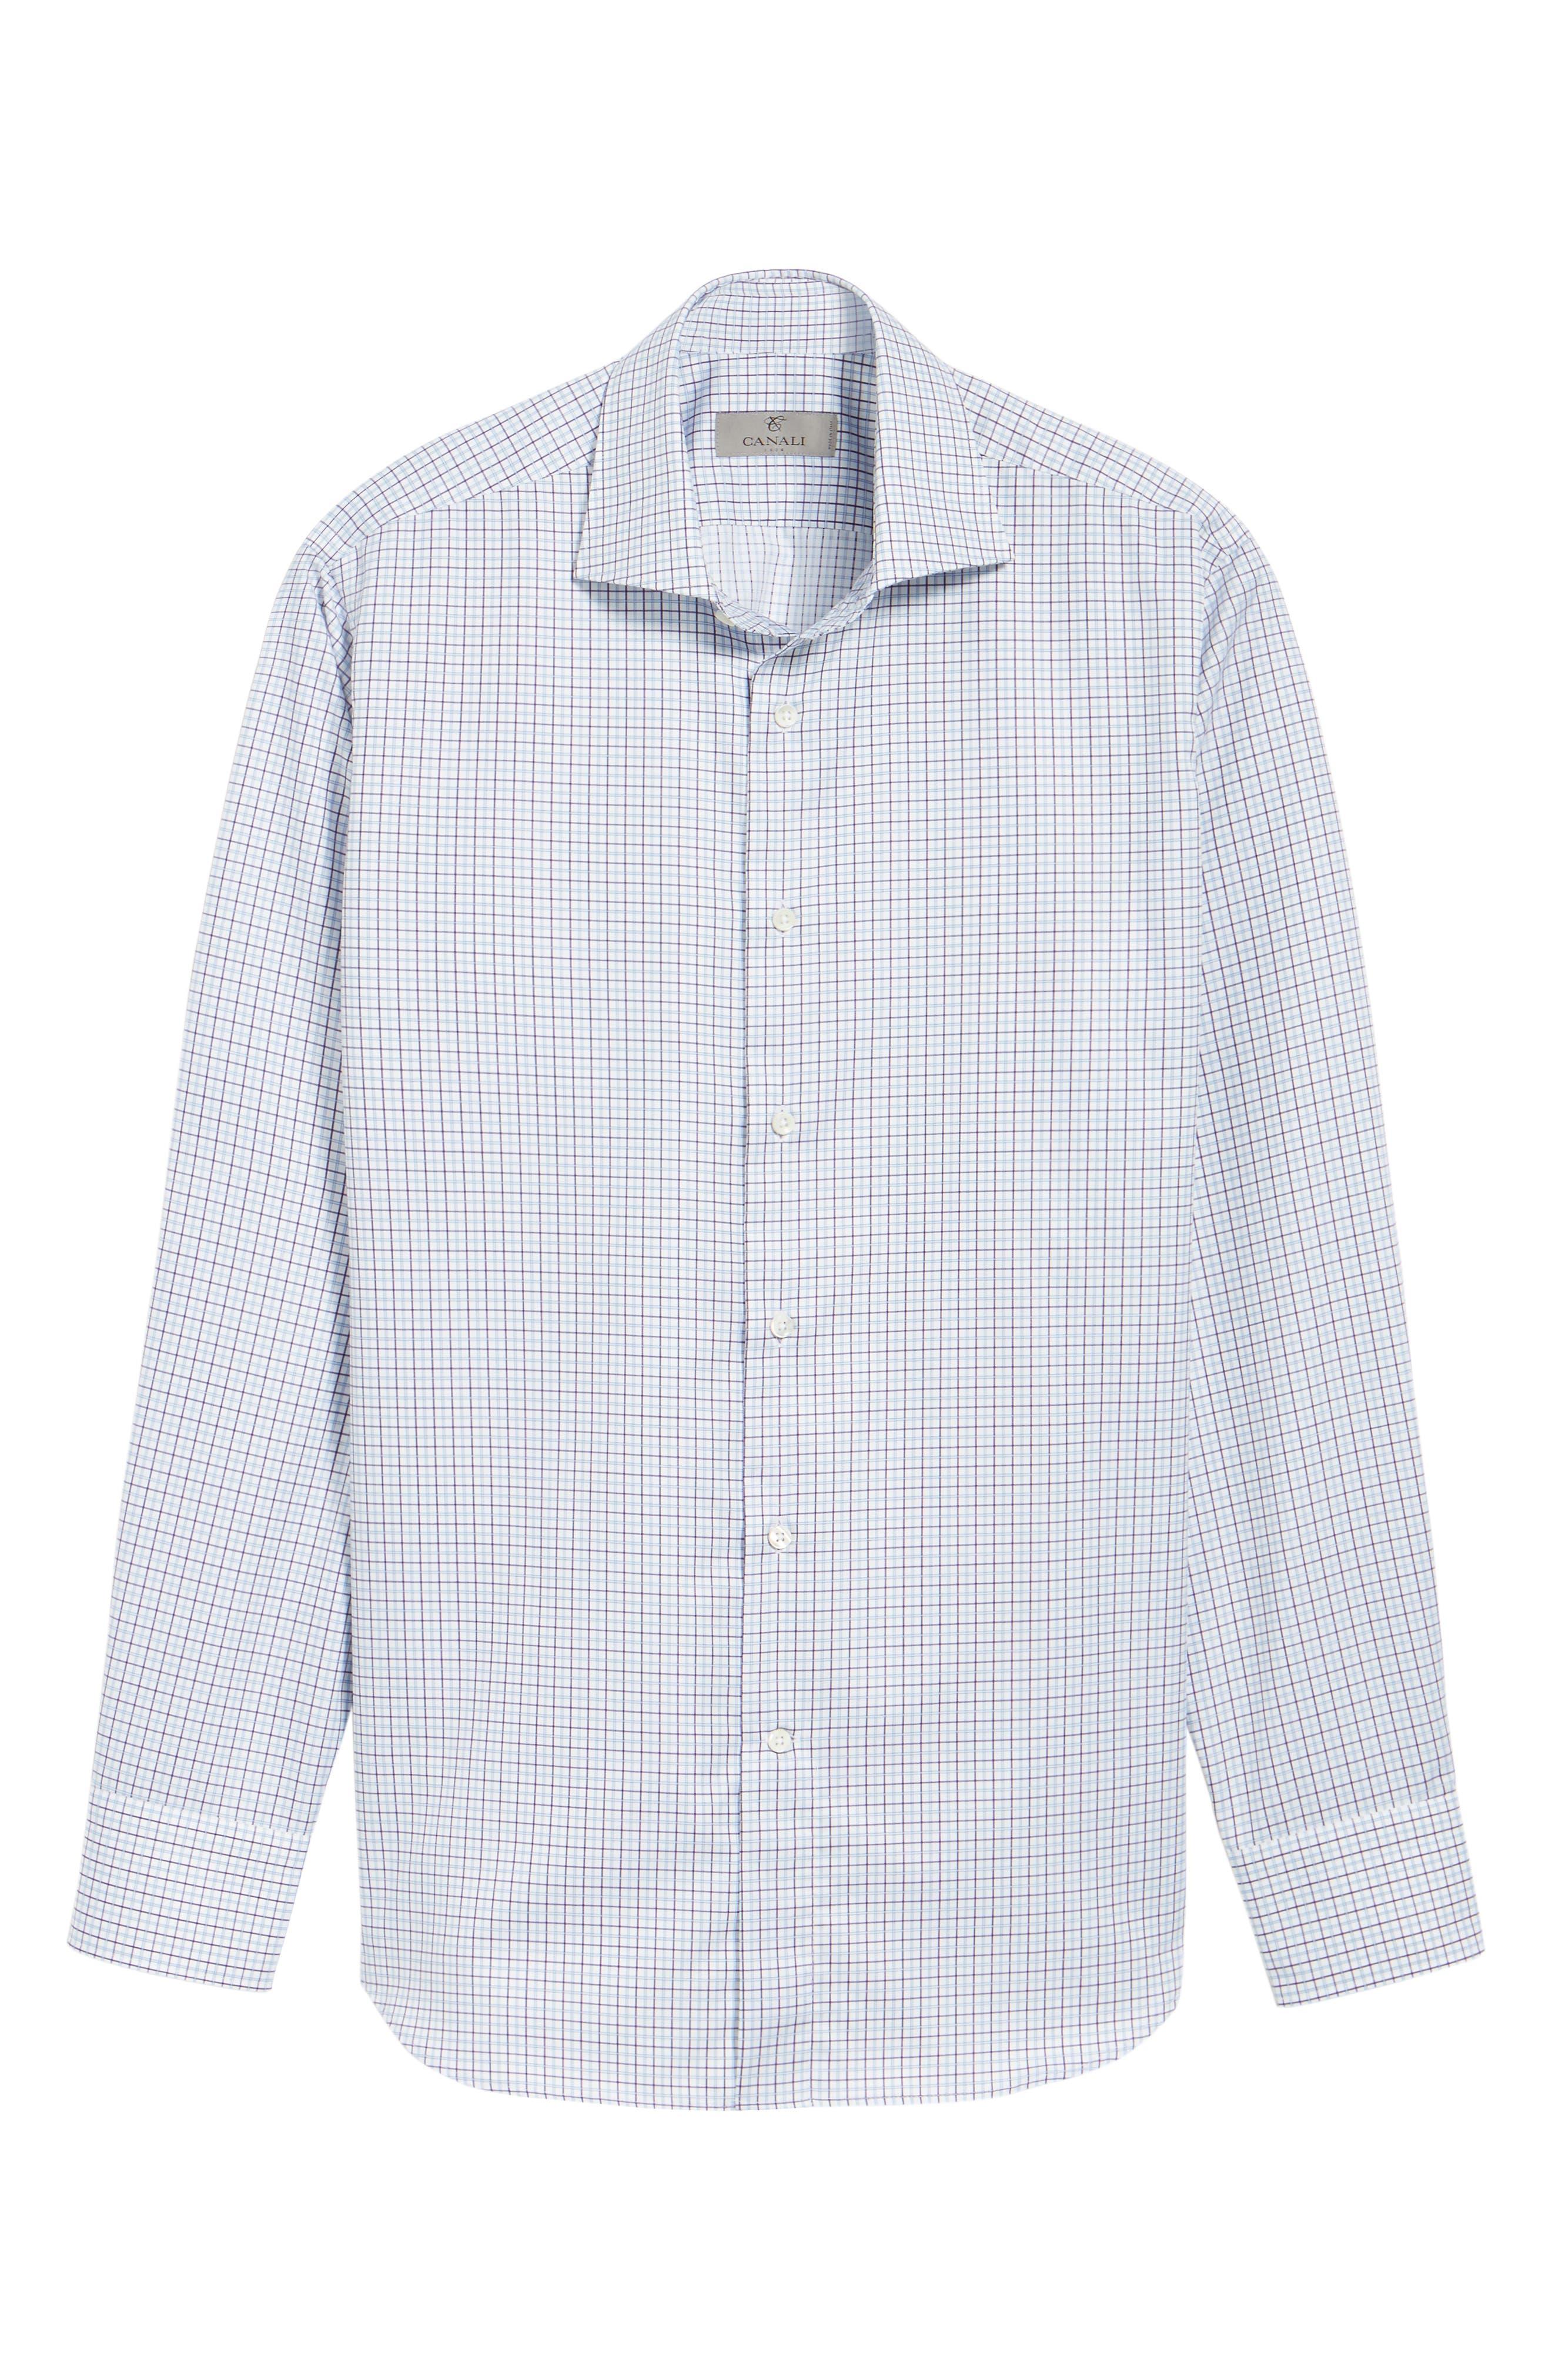 Regular Fit Check Dress Shirt,                             Alternate thumbnail 3, color,                             540